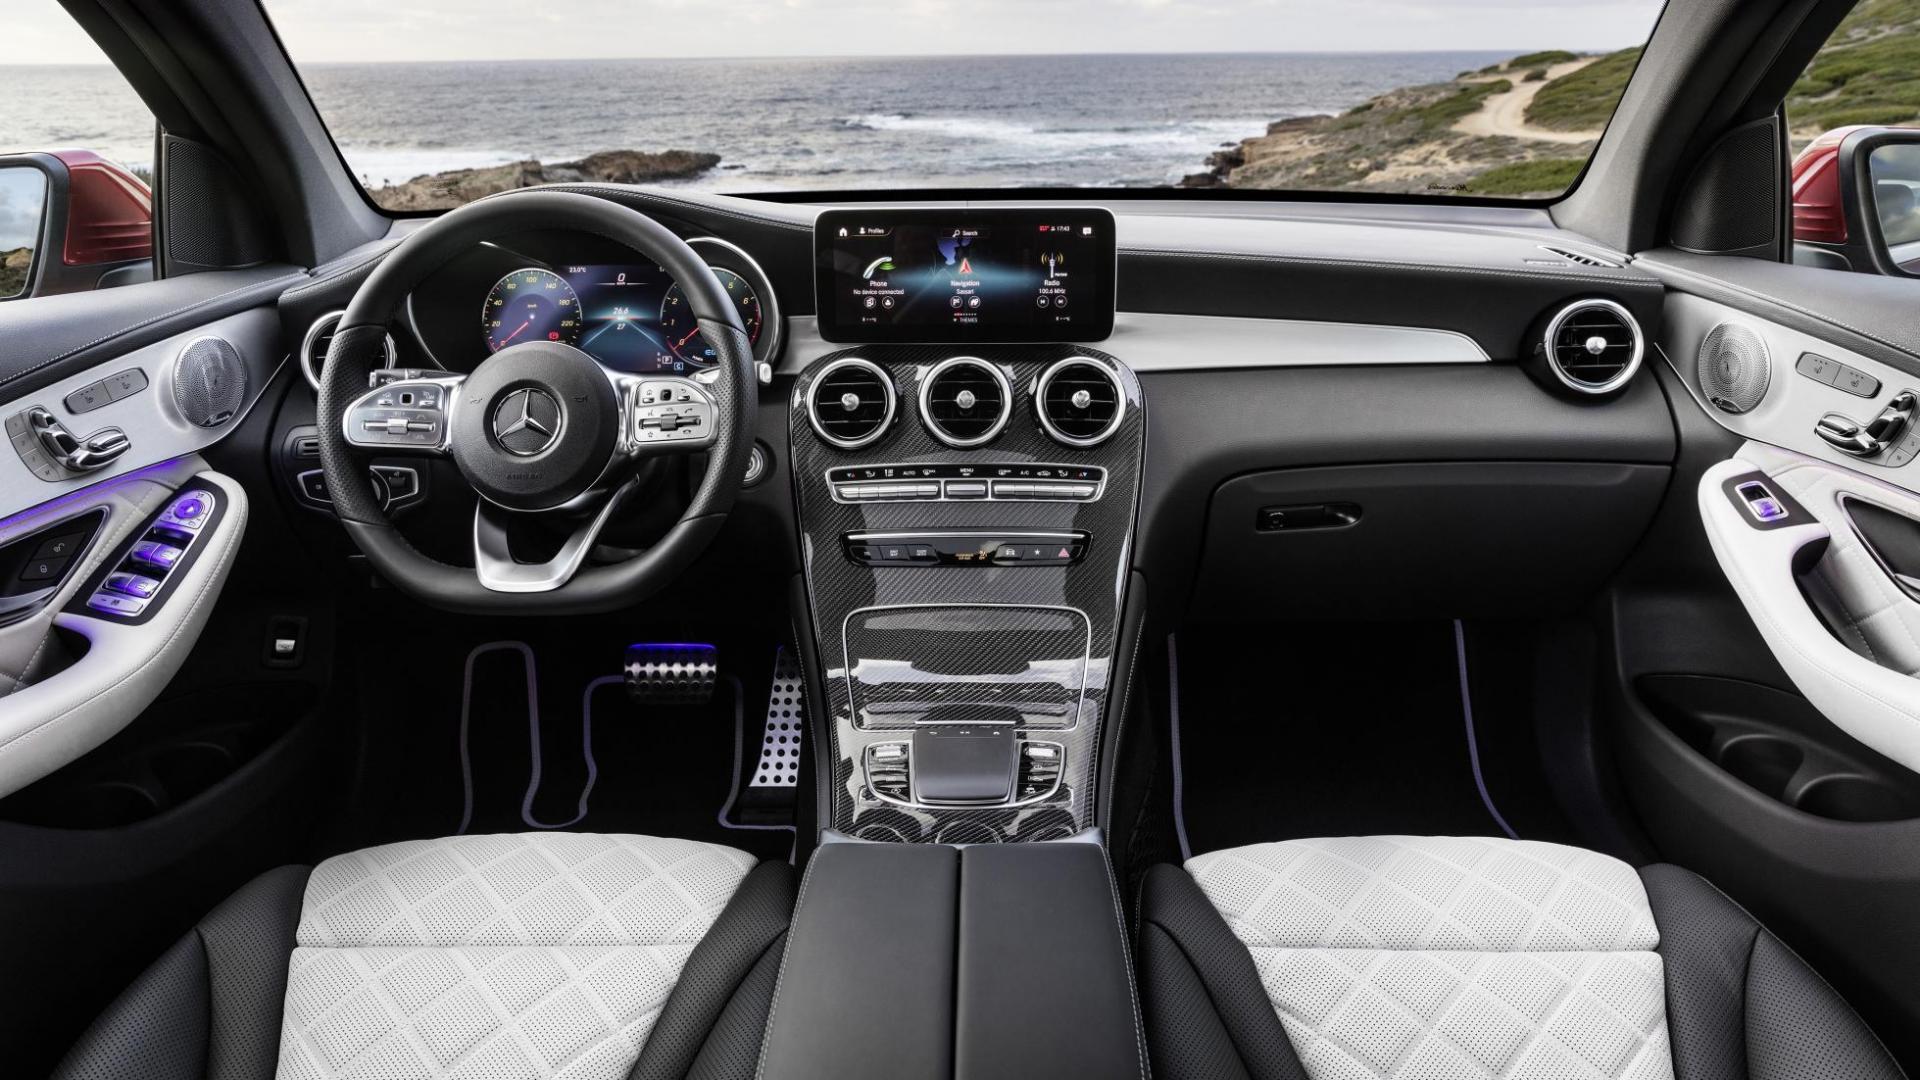 Mercedes GLC Coupé-facelift interieur dashboard